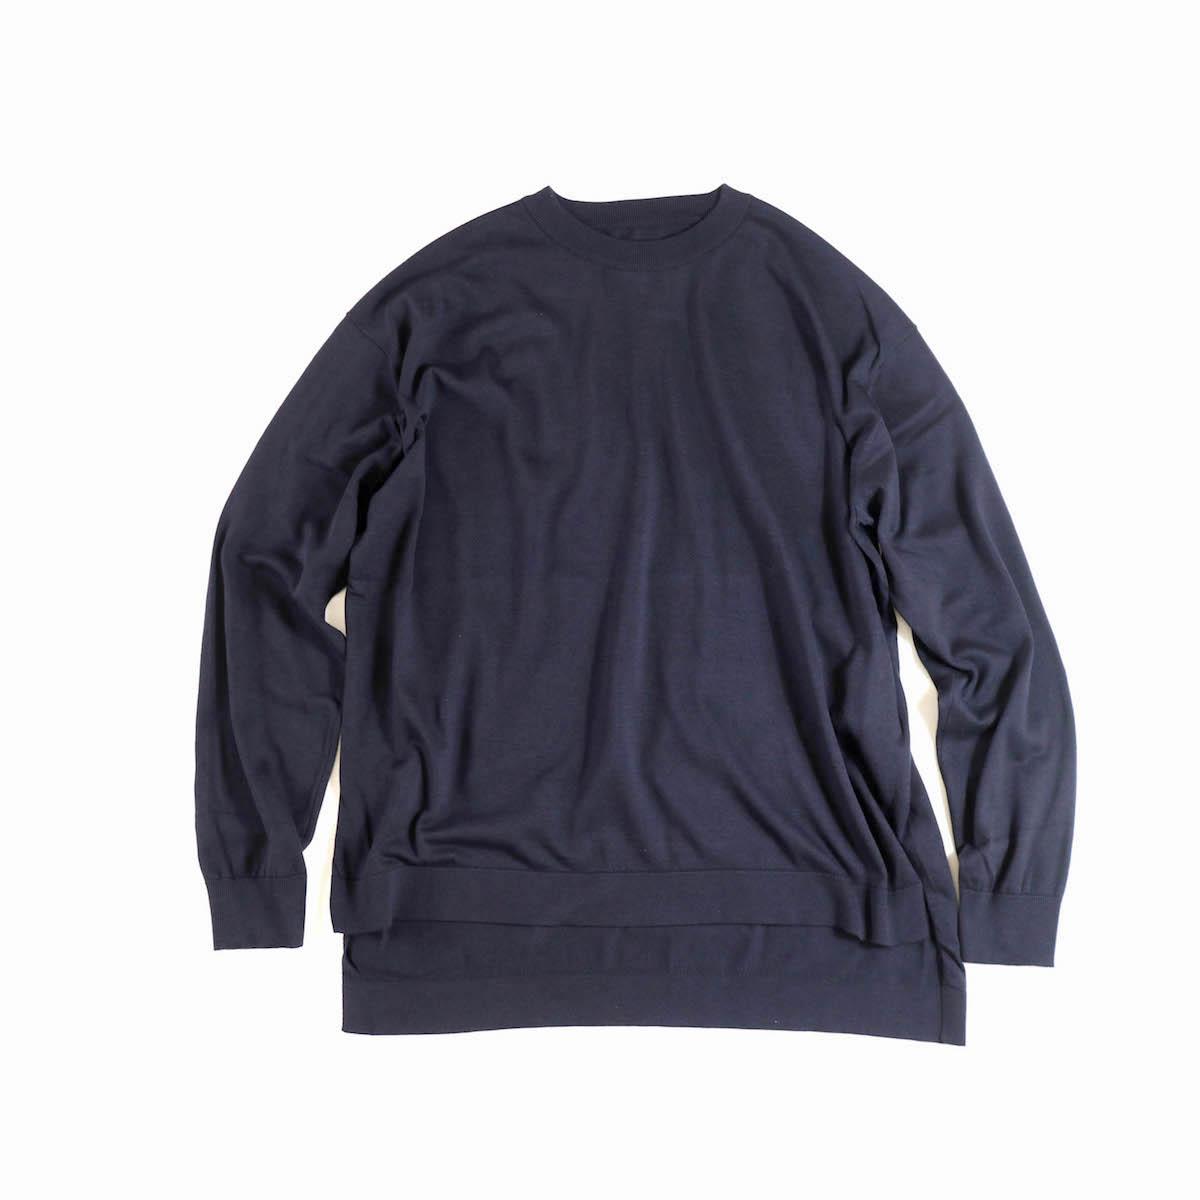 KAPTAIN SUNSHINE / Crewneck Long Sleeved Puollover Knit -Navy